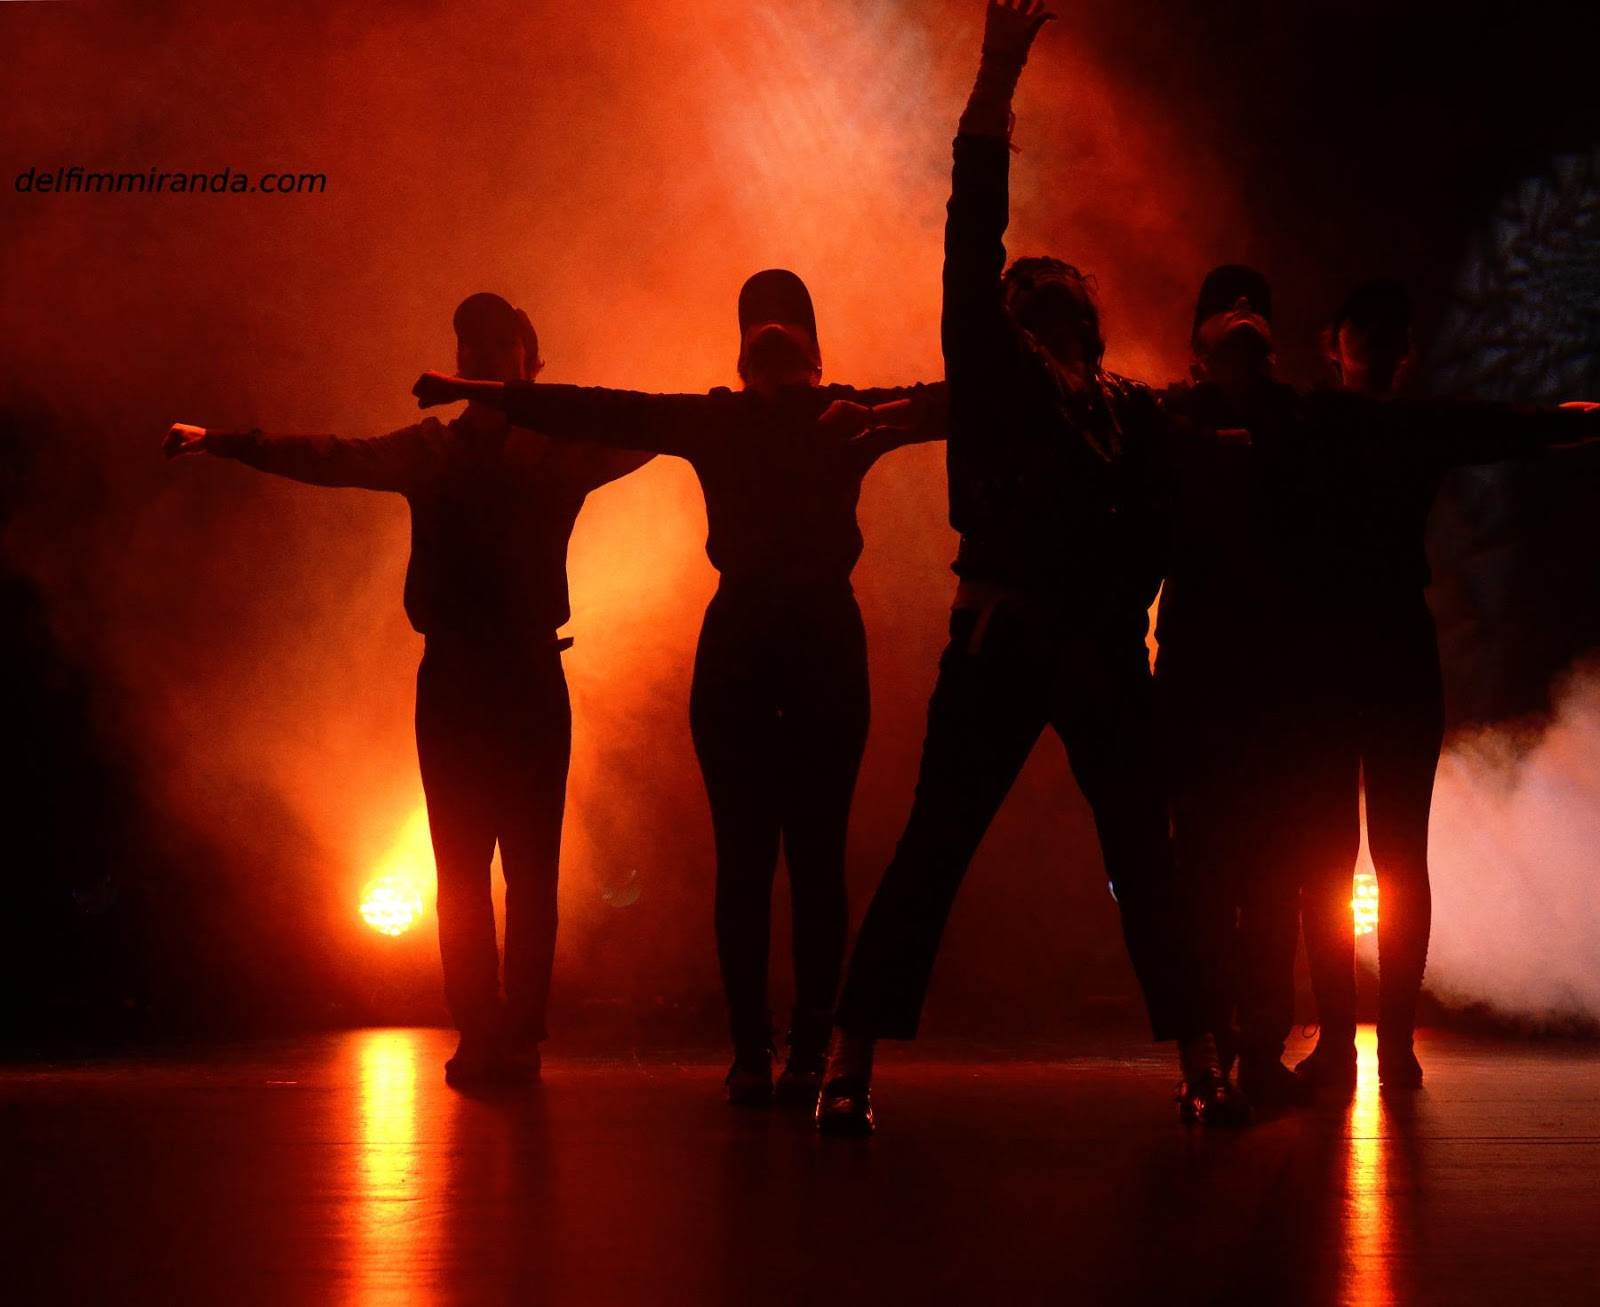 Delfim Miranda - Michael Jackson Tribute - End of Jam